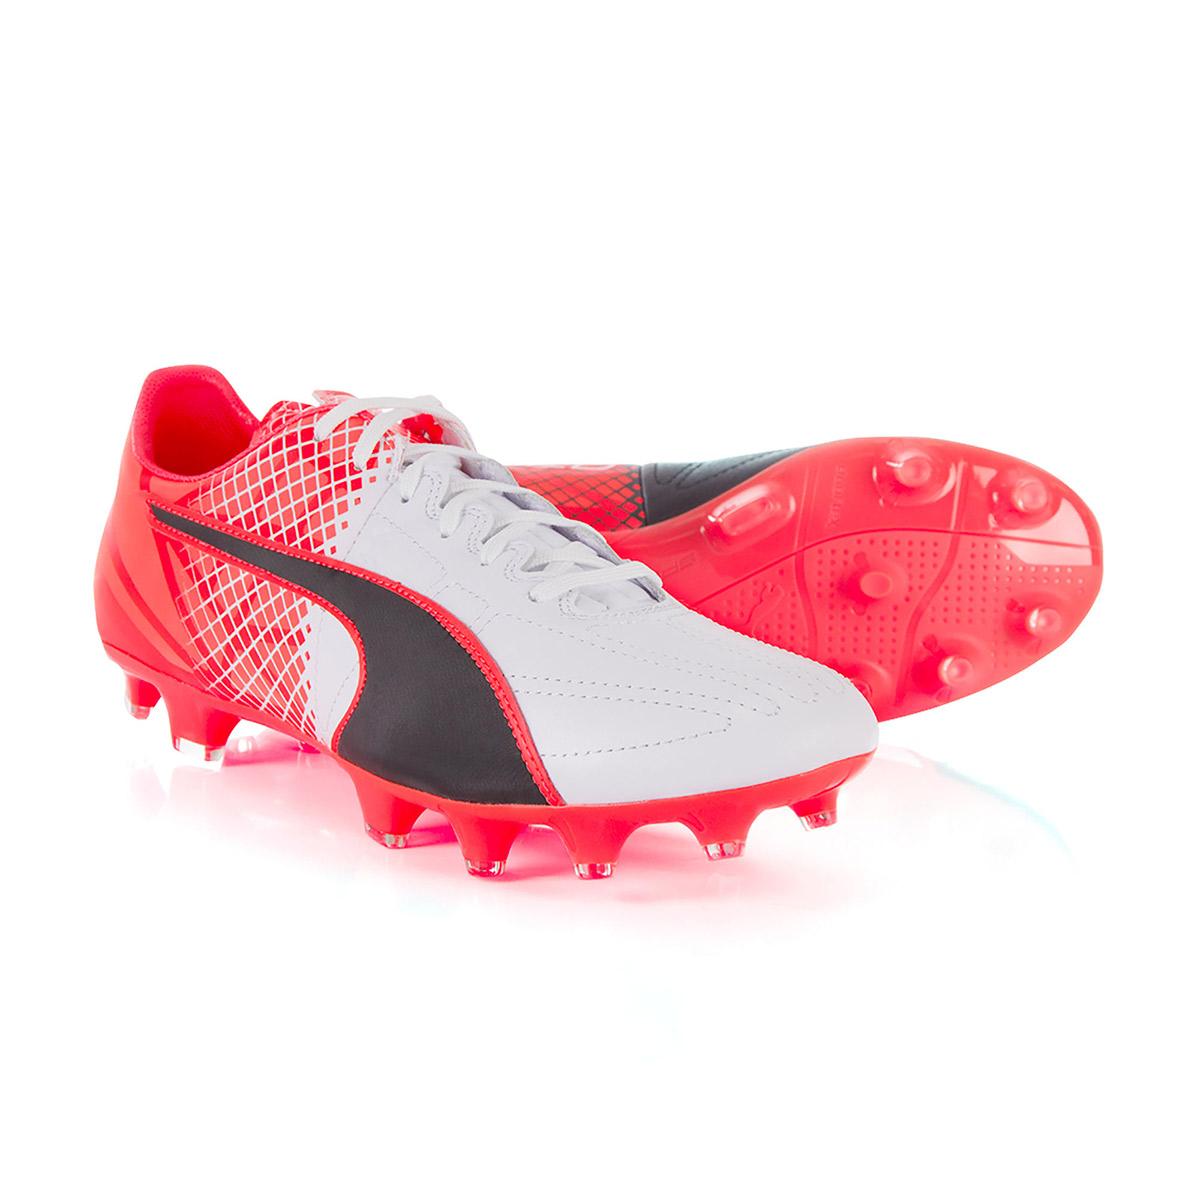 acheter en ligne b0b23 c8ede Mens Black Puma evoSPEED 3.5 Leather FG Boots